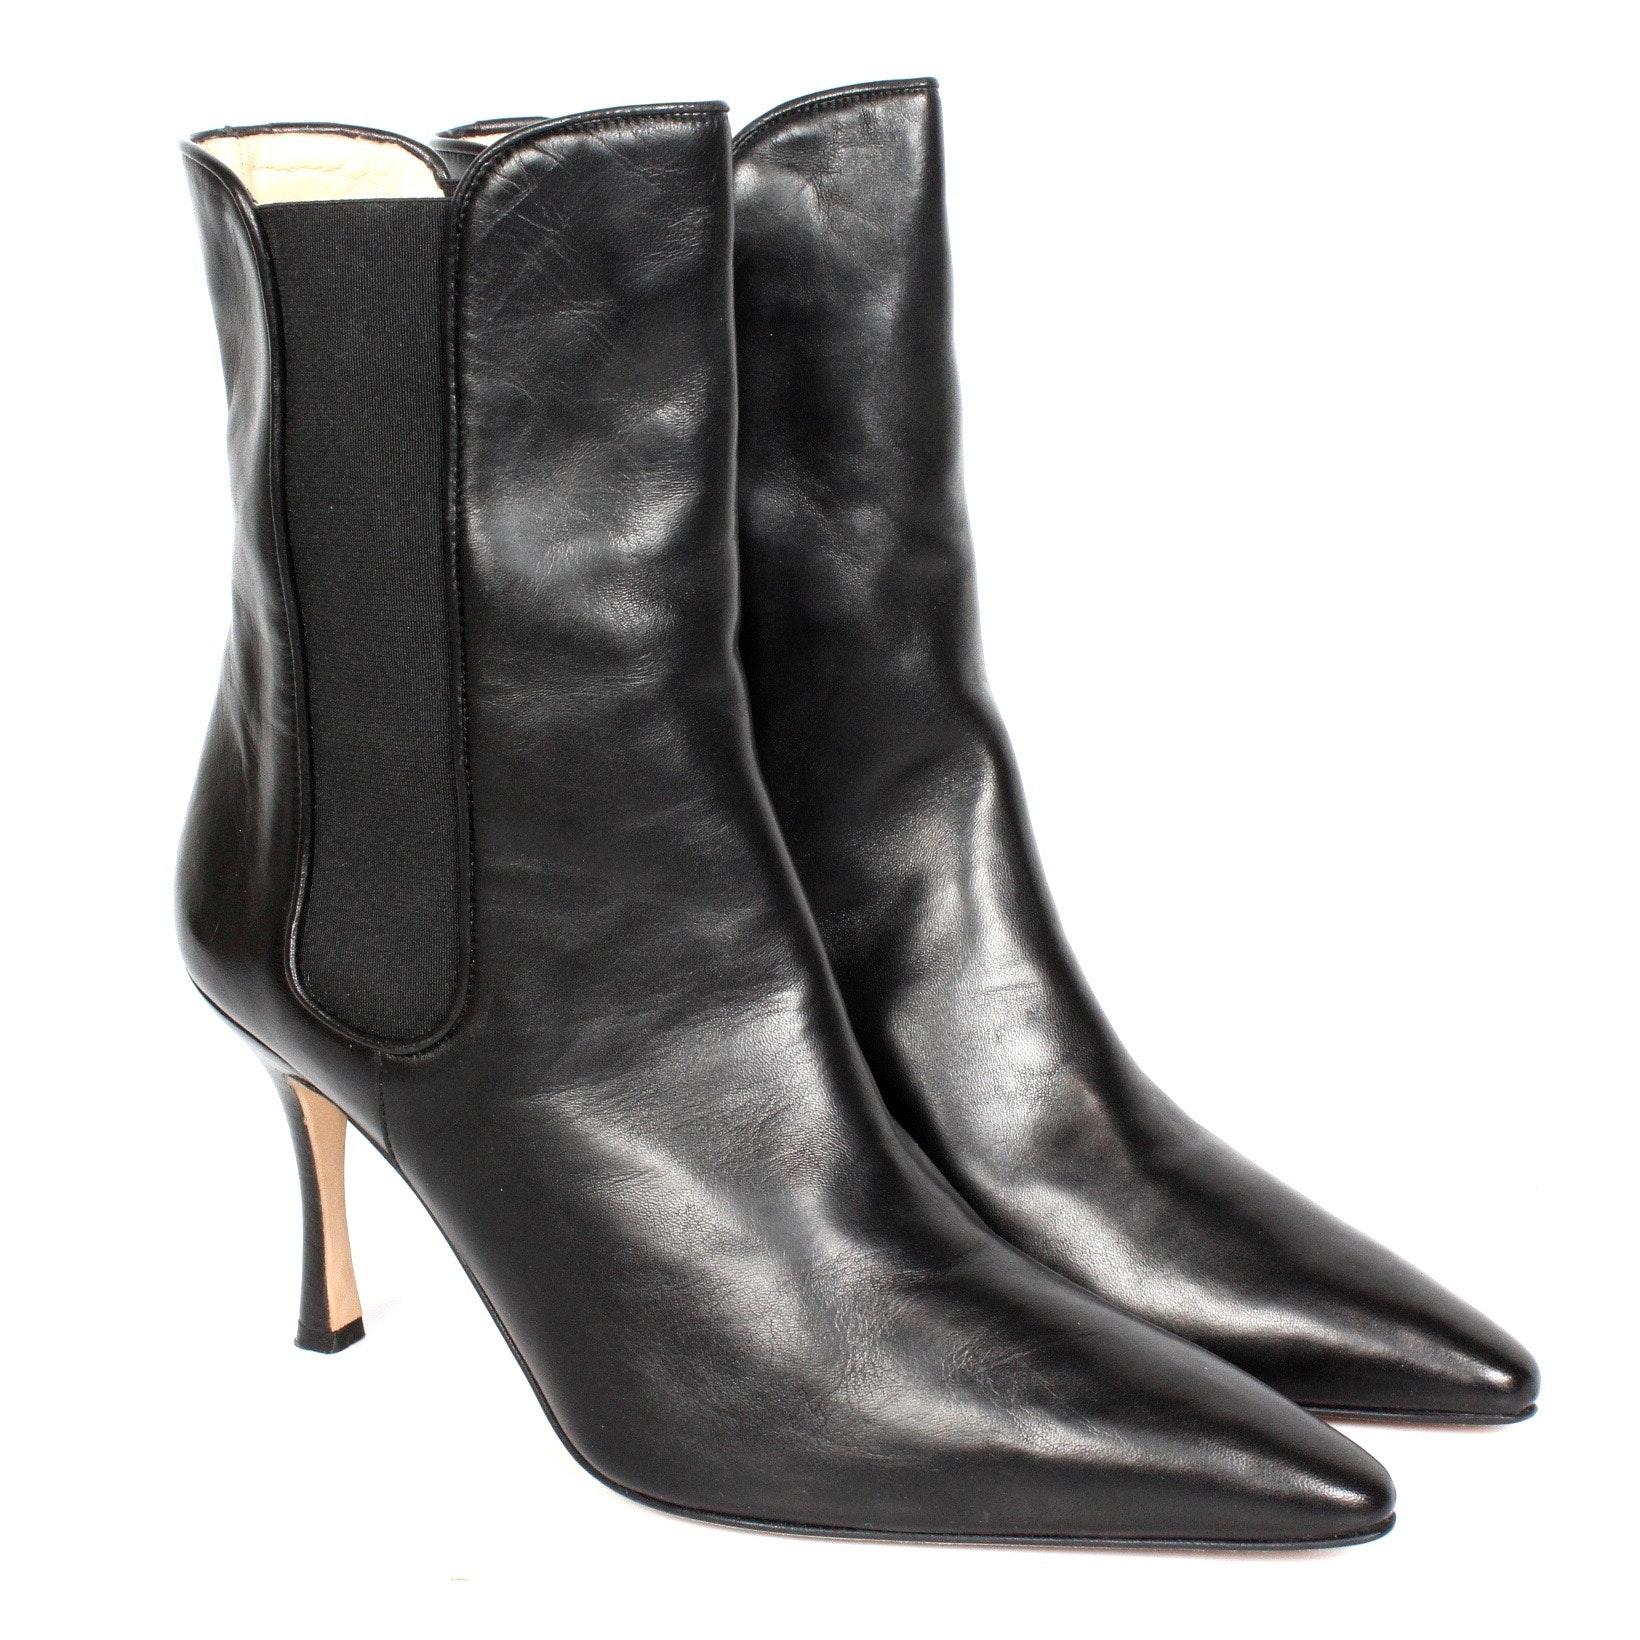 Manolo Blahnik Totalo Nappa Black Ankle Boots